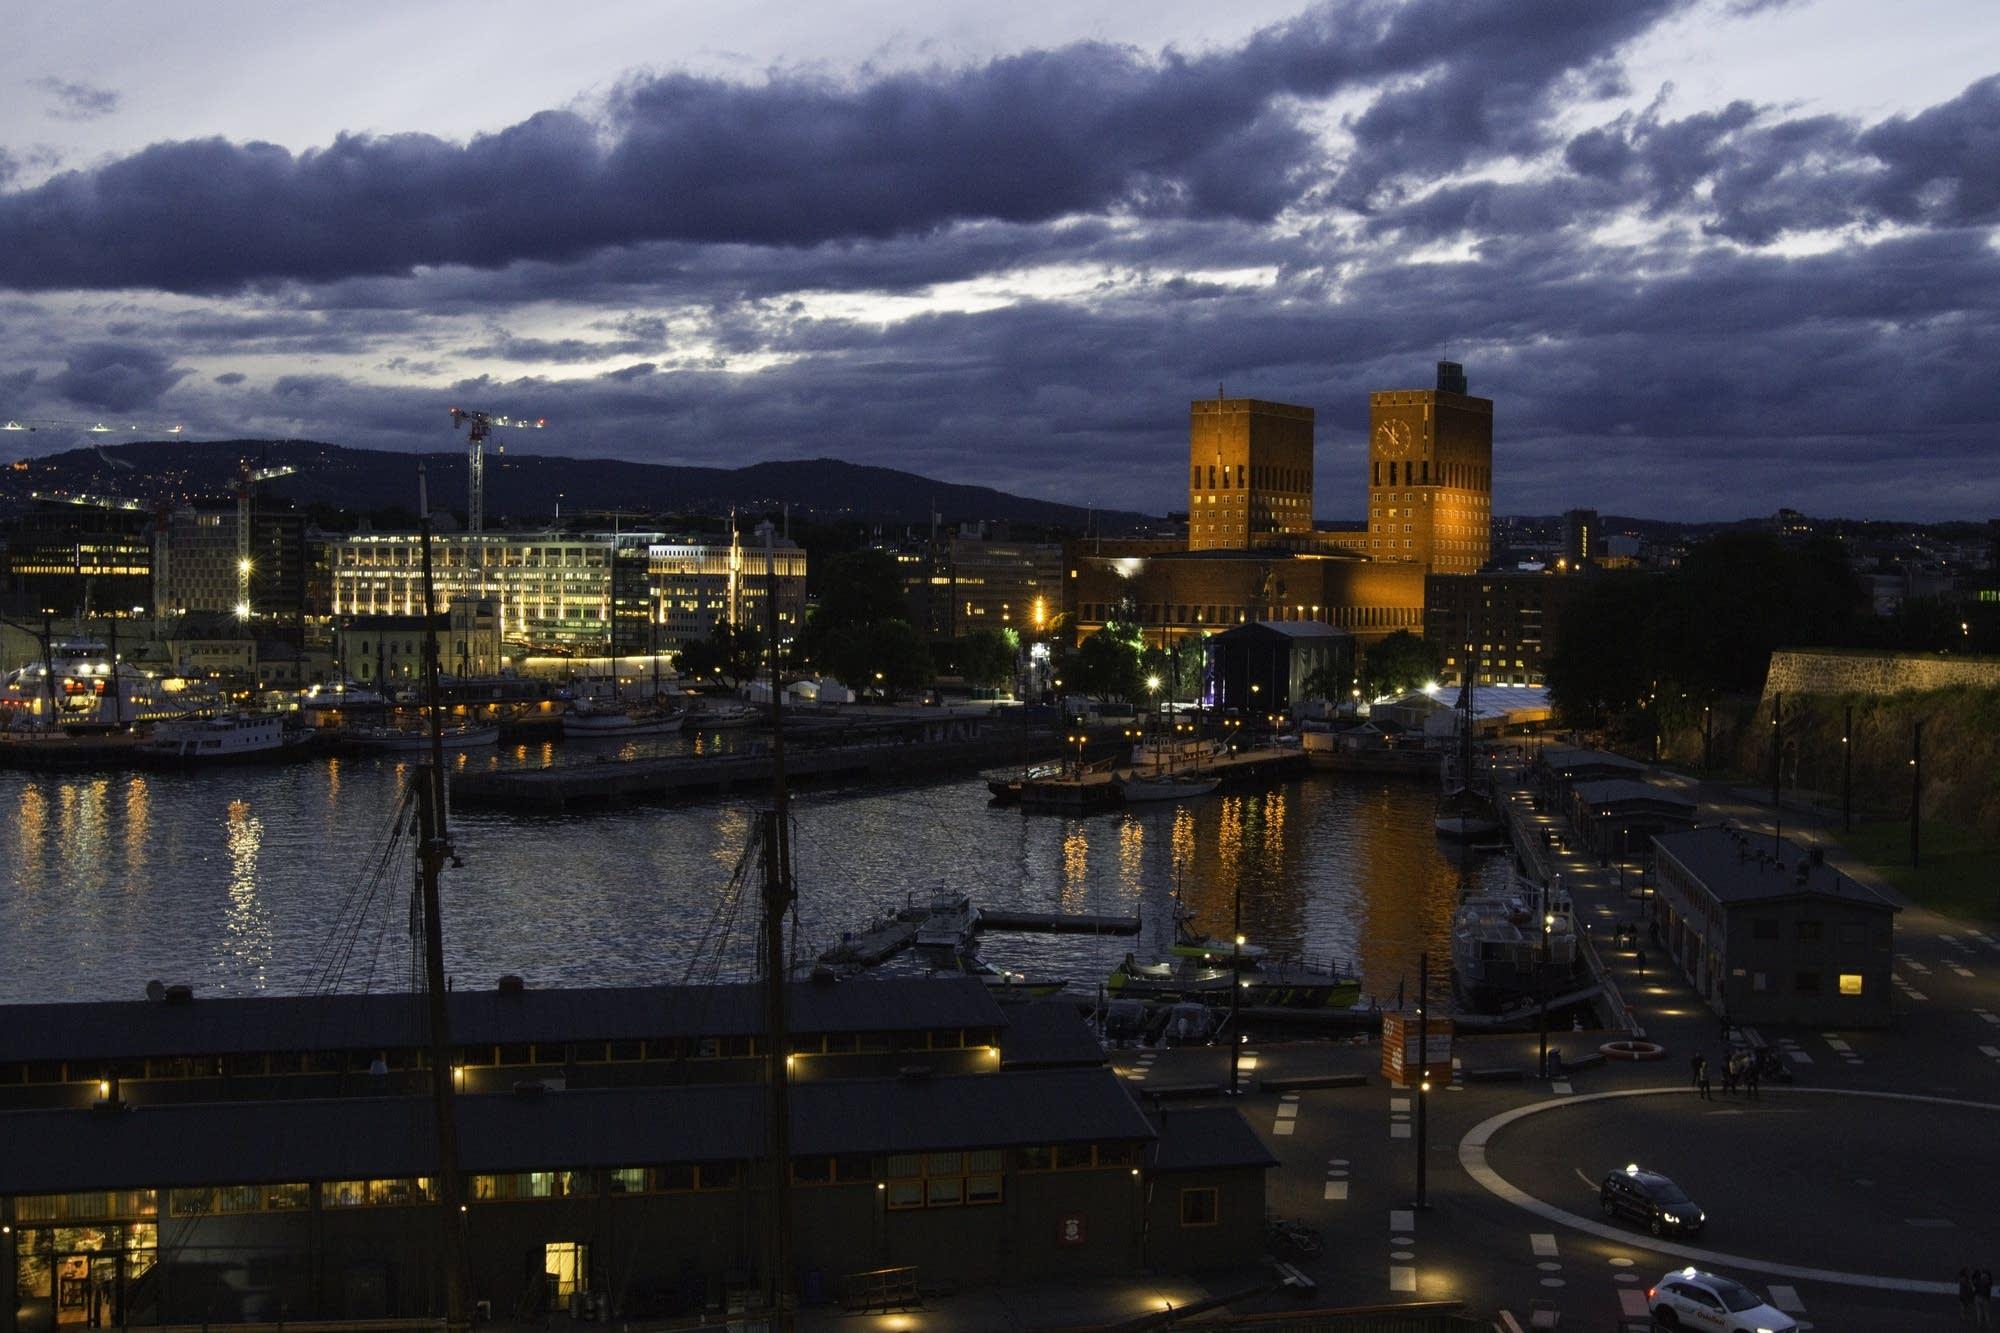 Oslo - 35 - Oslo at night